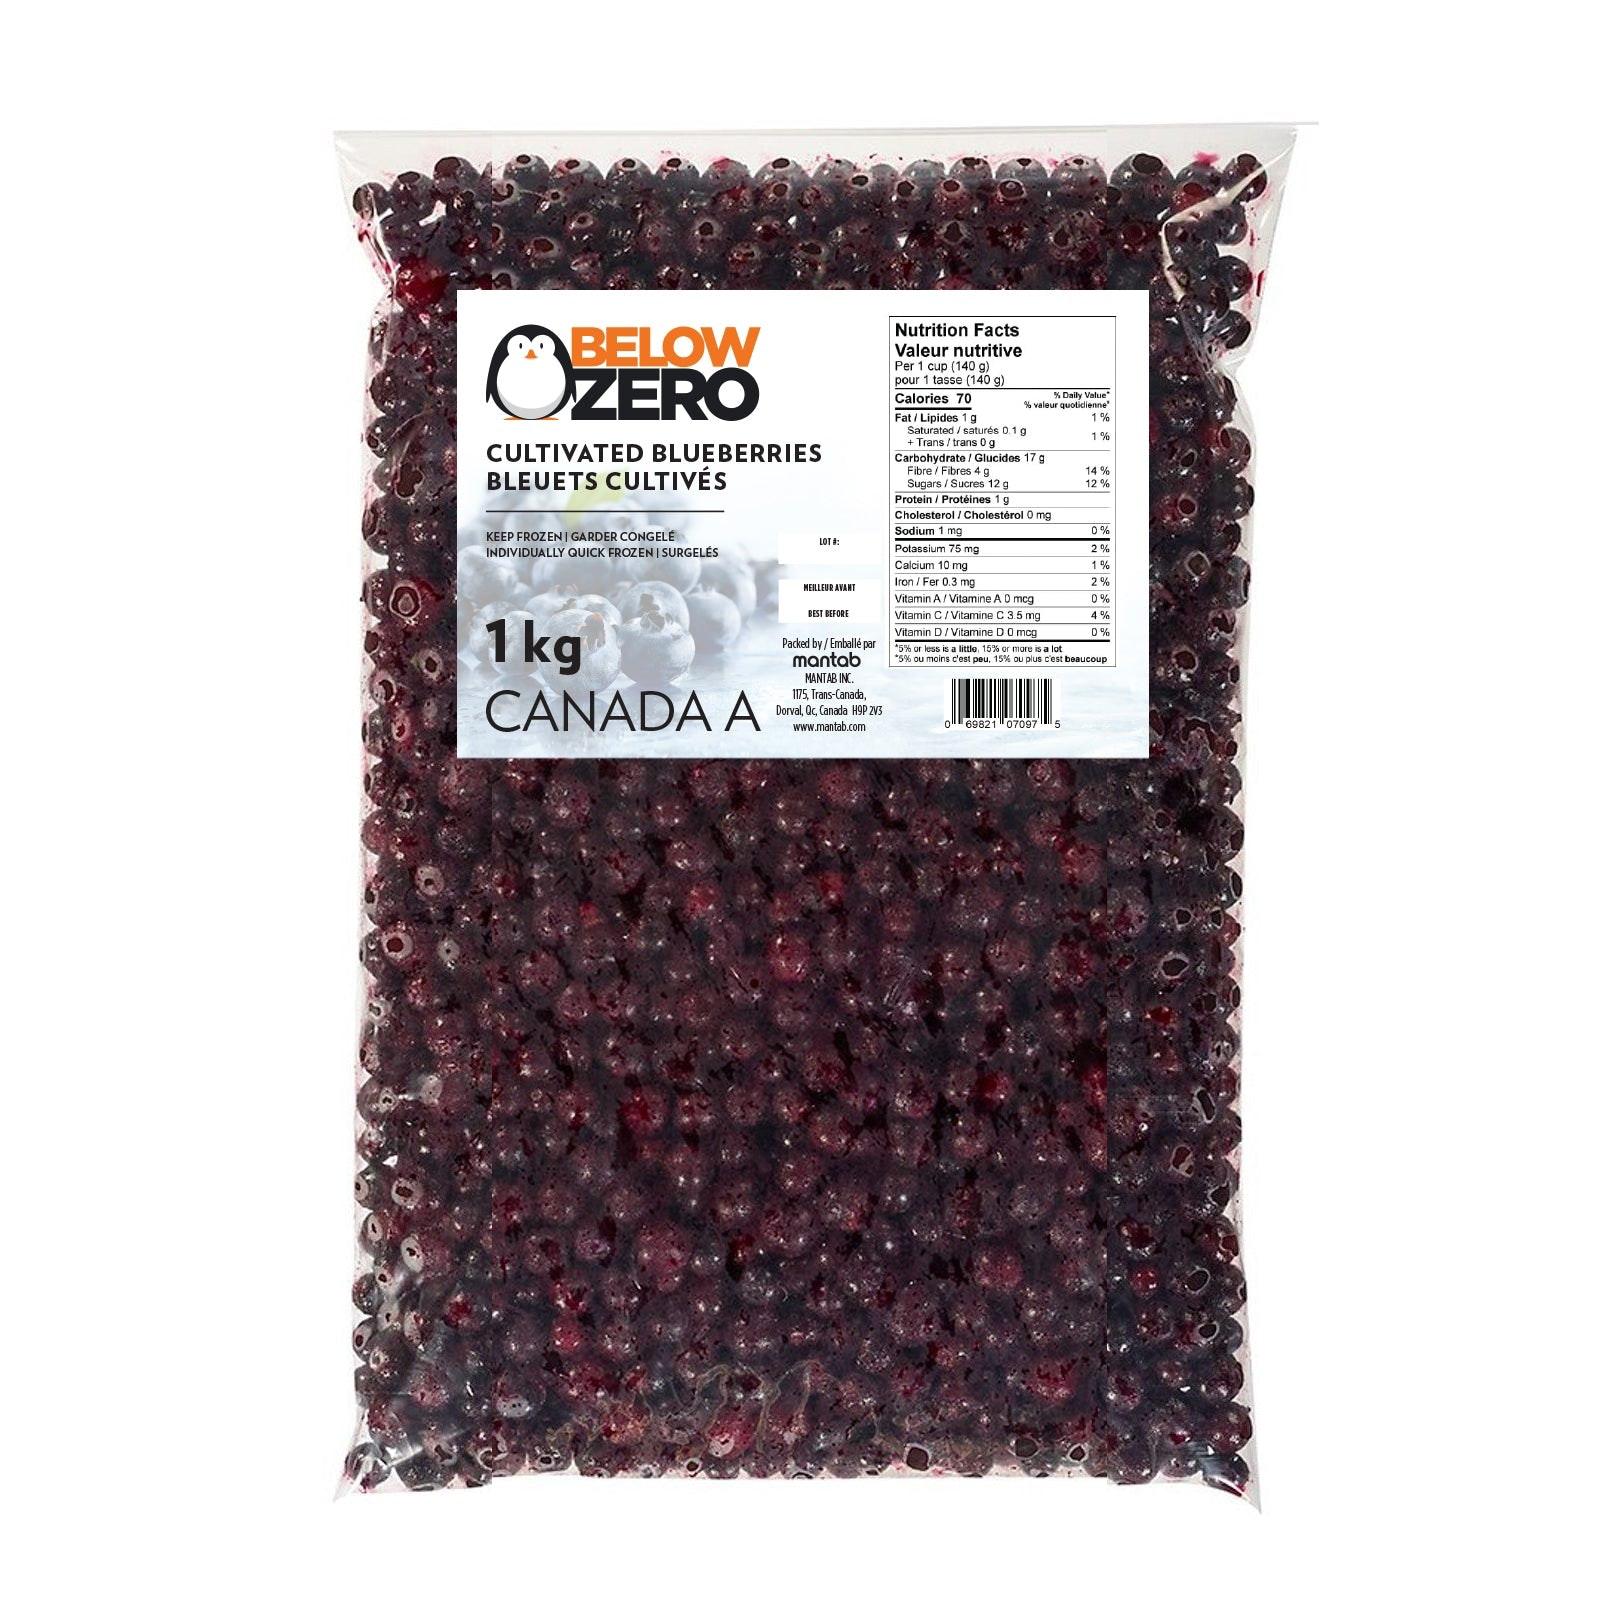 BELOW ZERO Cultivated blueberries